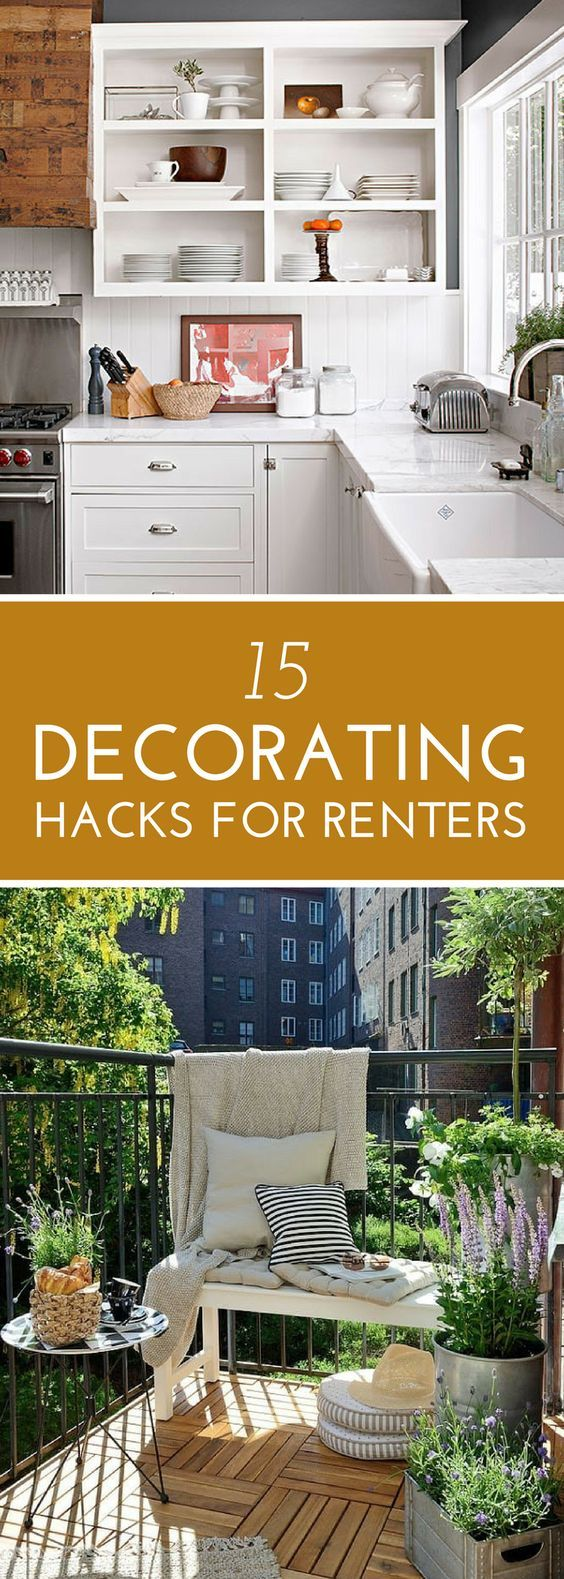 15 Decorating Hacks for Renters That Wonu0027t